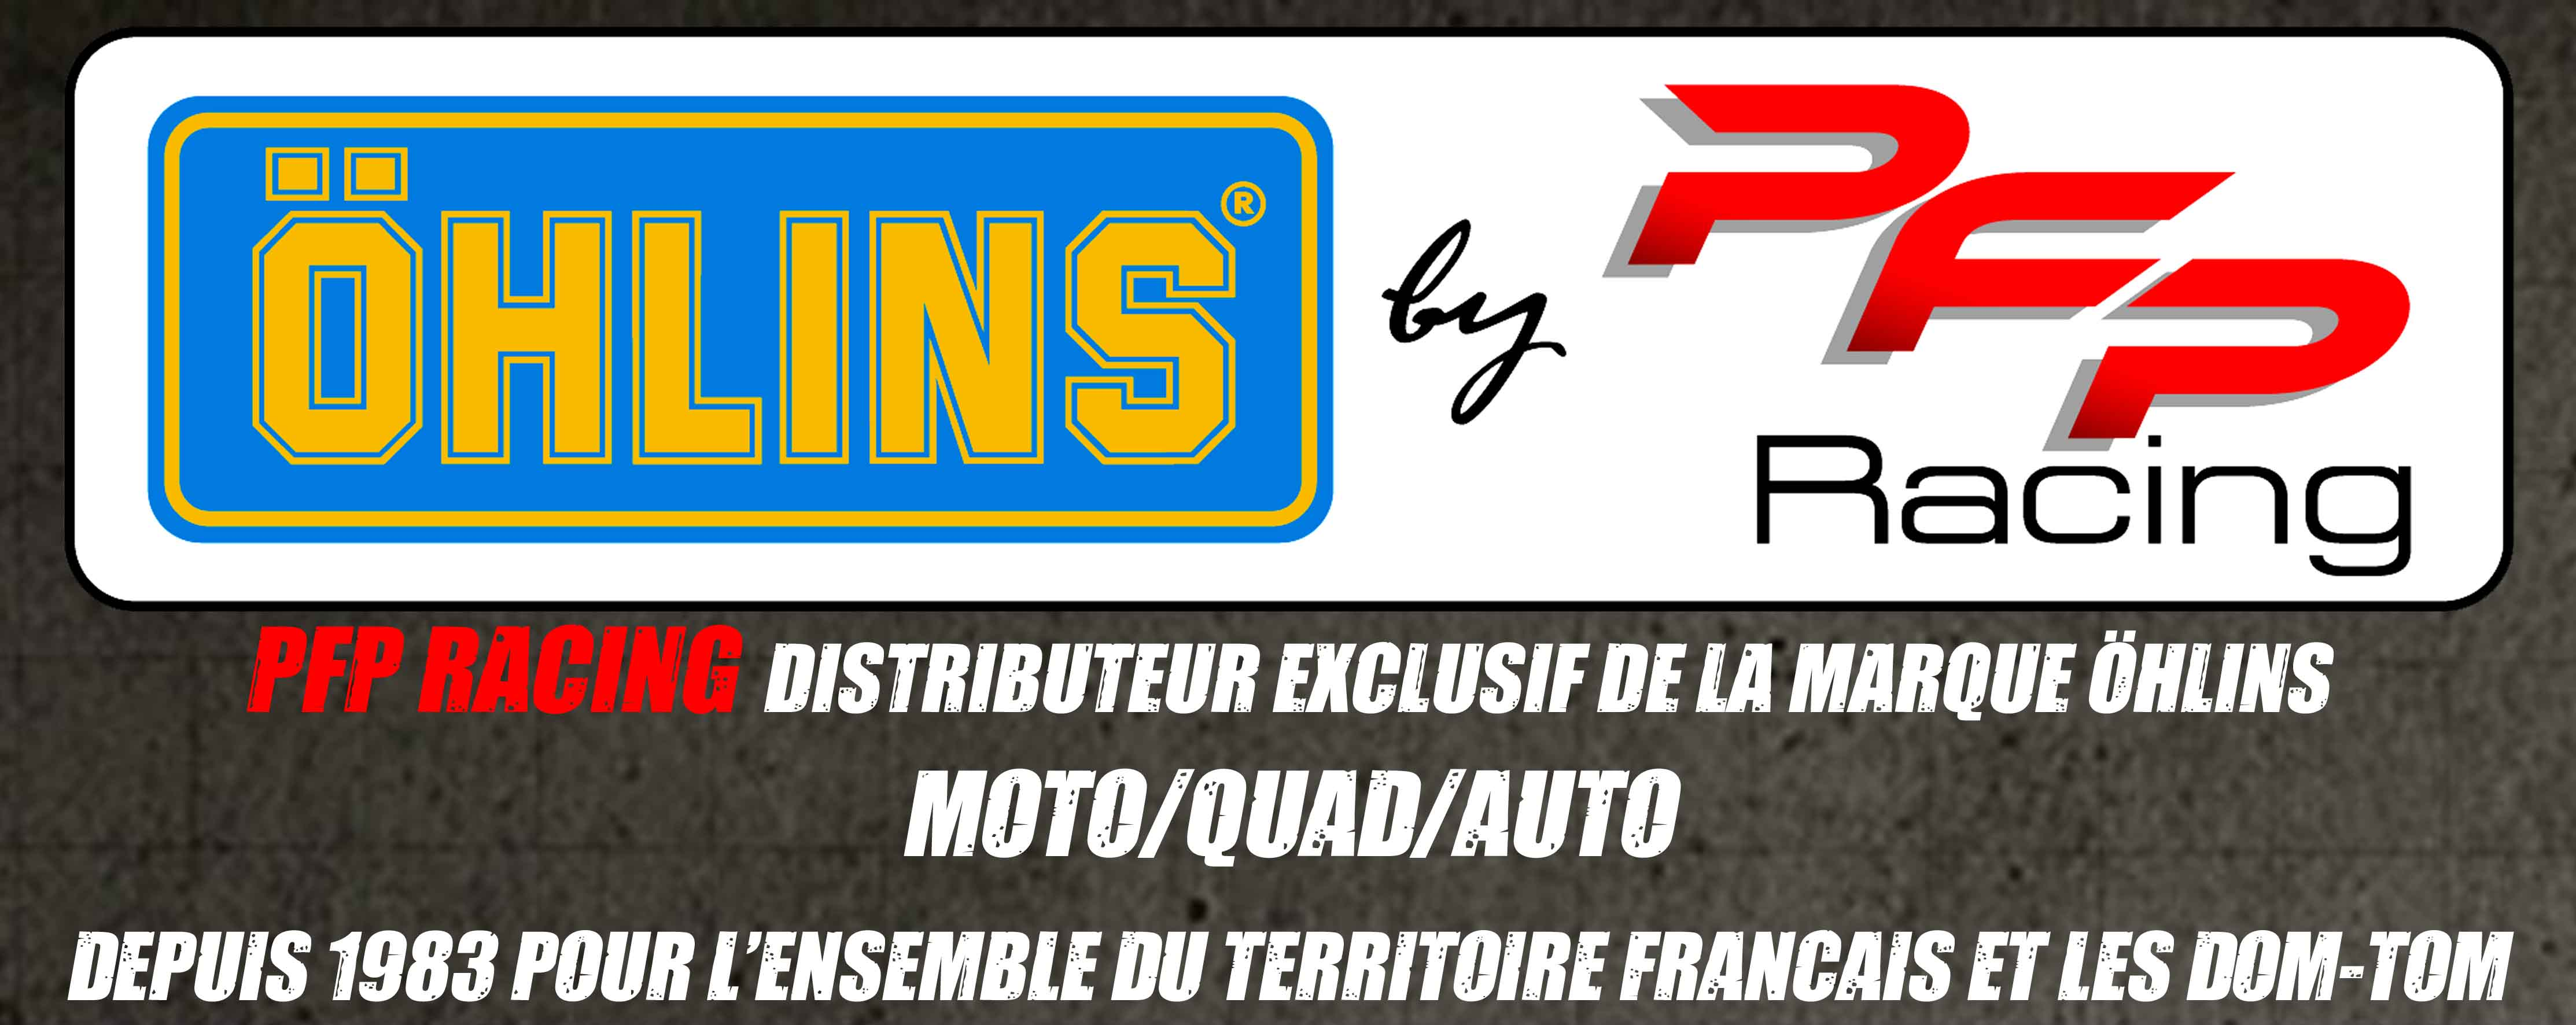 Logo Pfp Racing